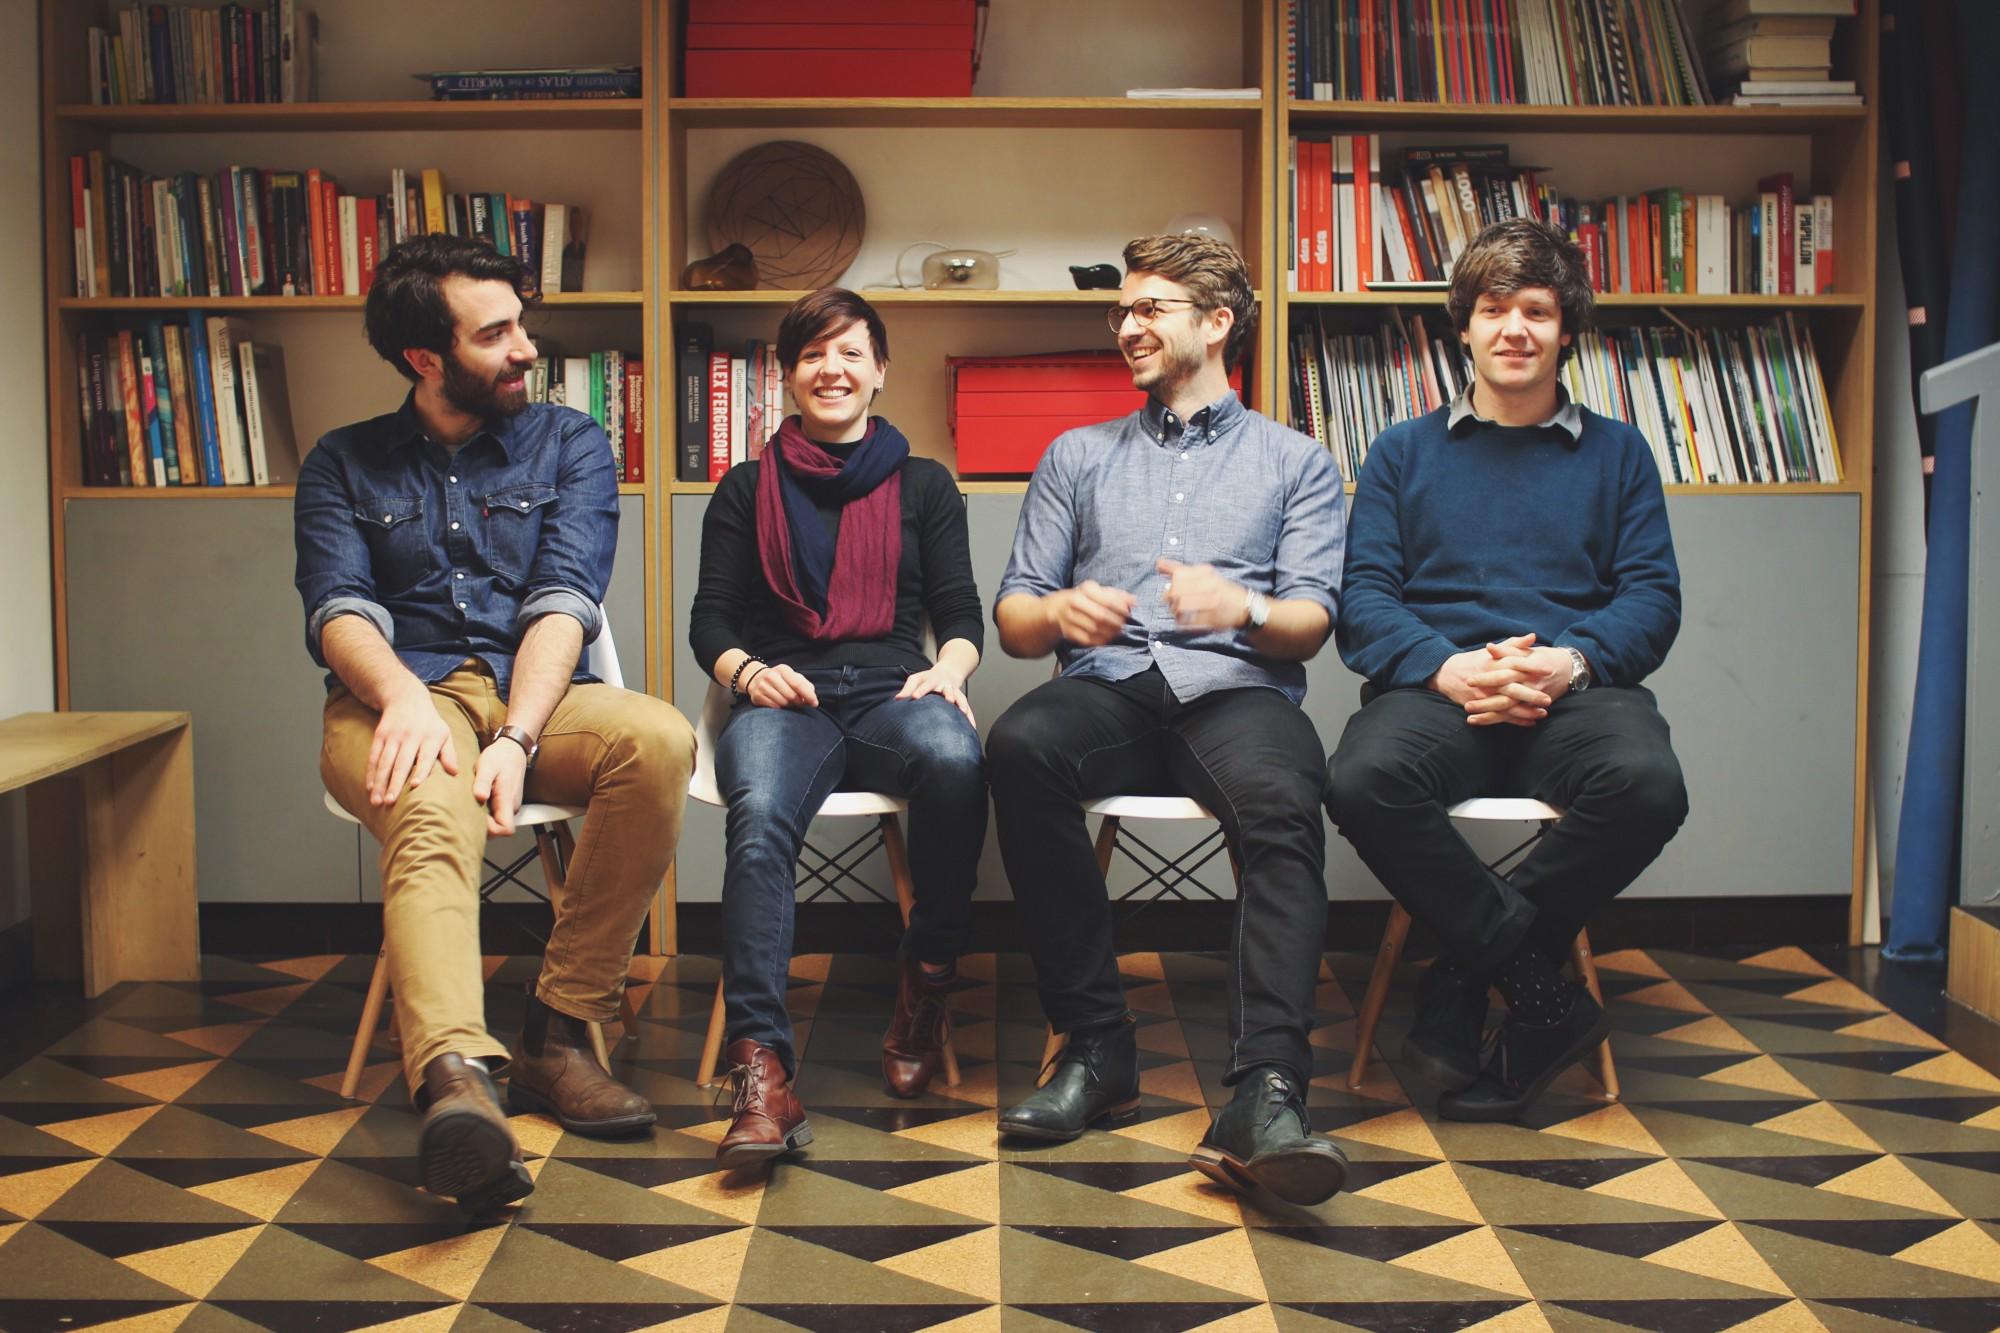 The Morrama team in 2016: Mike, myself, Rob & Michael.